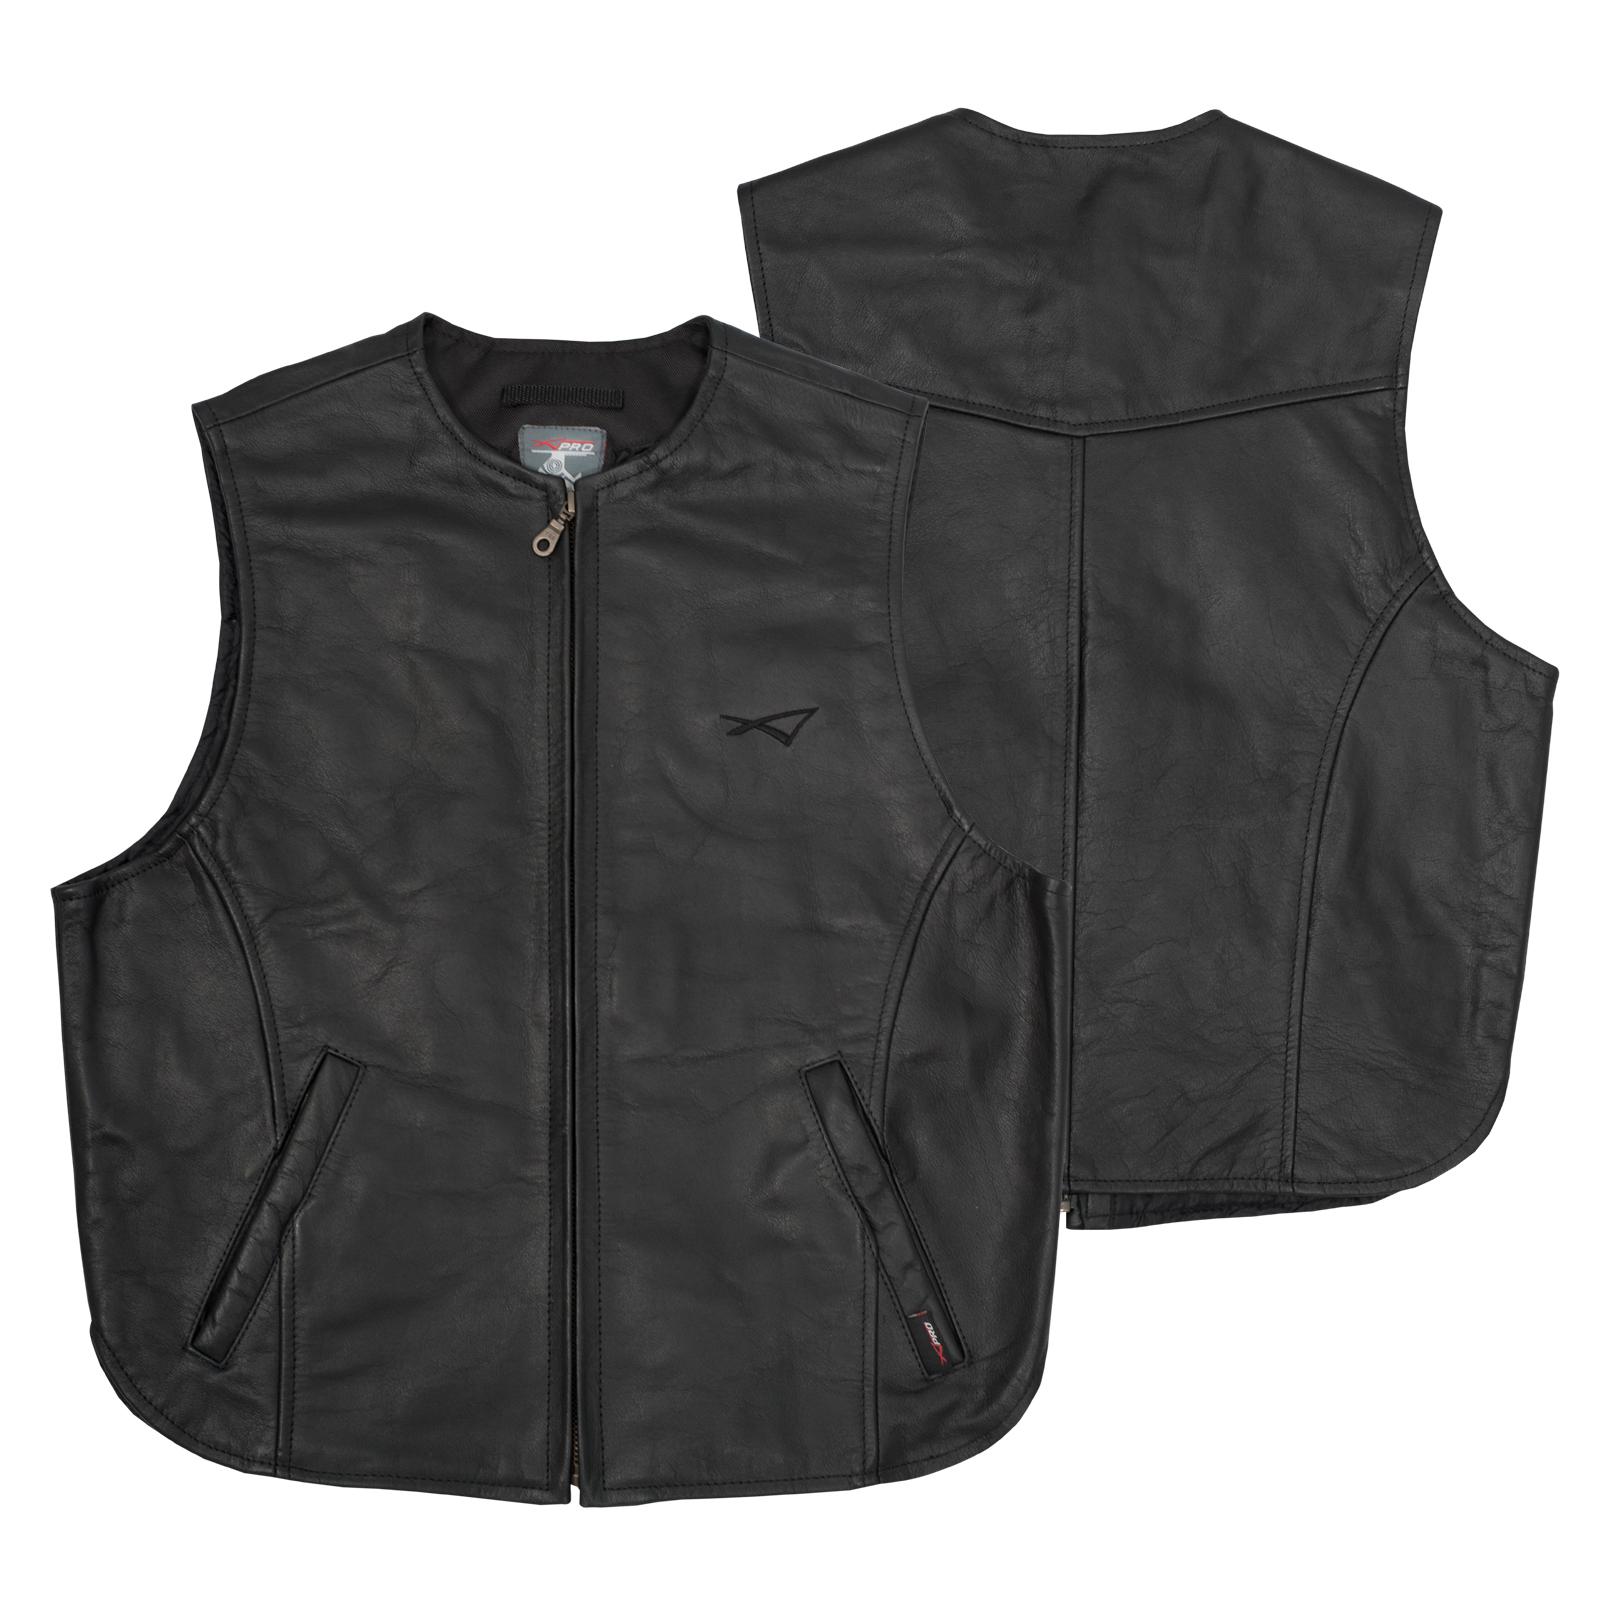 gilet cuir vachette classic noir motard moto chopper custom qualit sans manches ebay. Black Bedroom Furniture Sets. Home Design Ideas